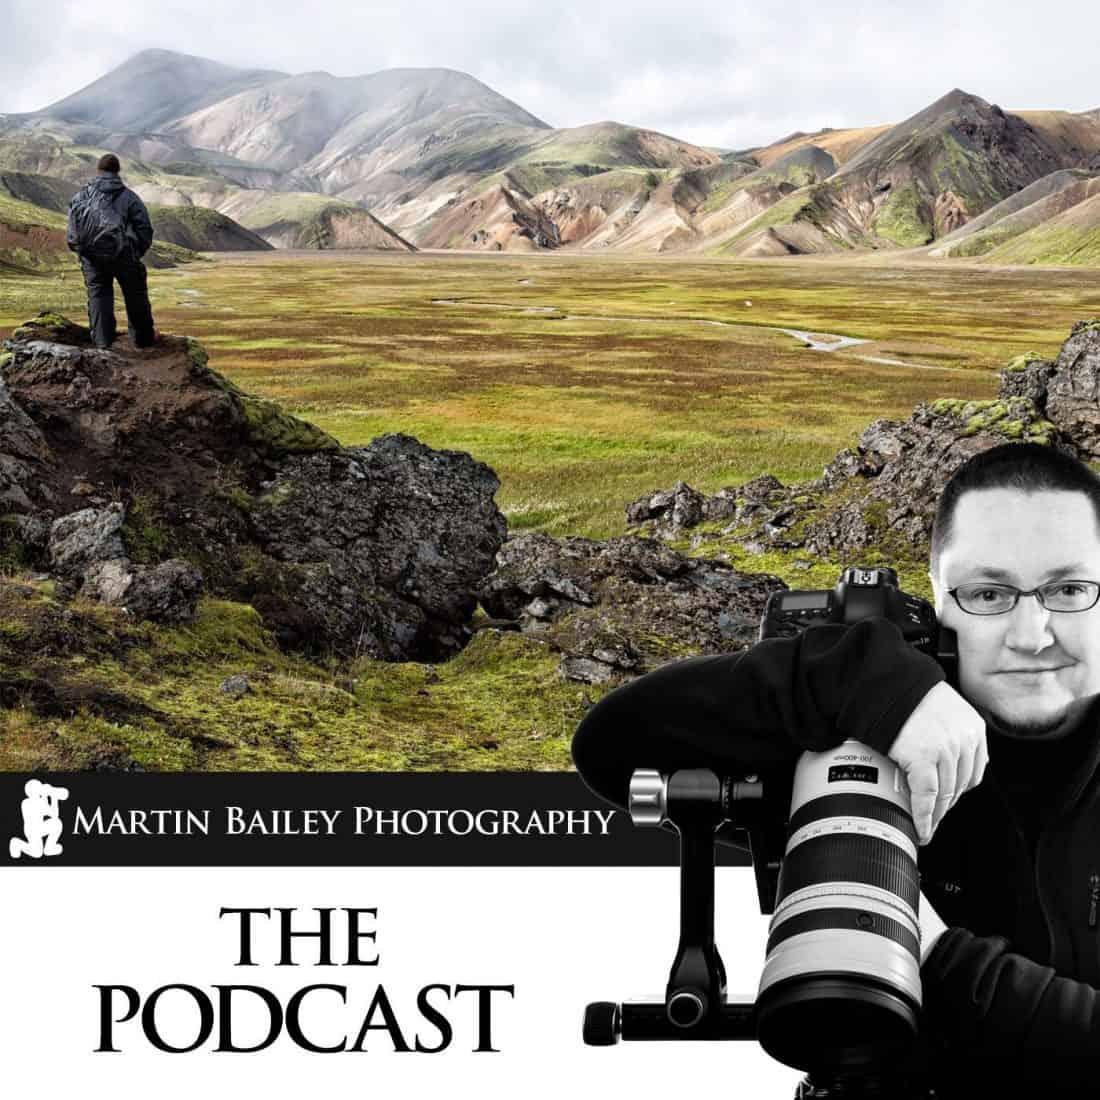 Martin Bailey Photography Podcast